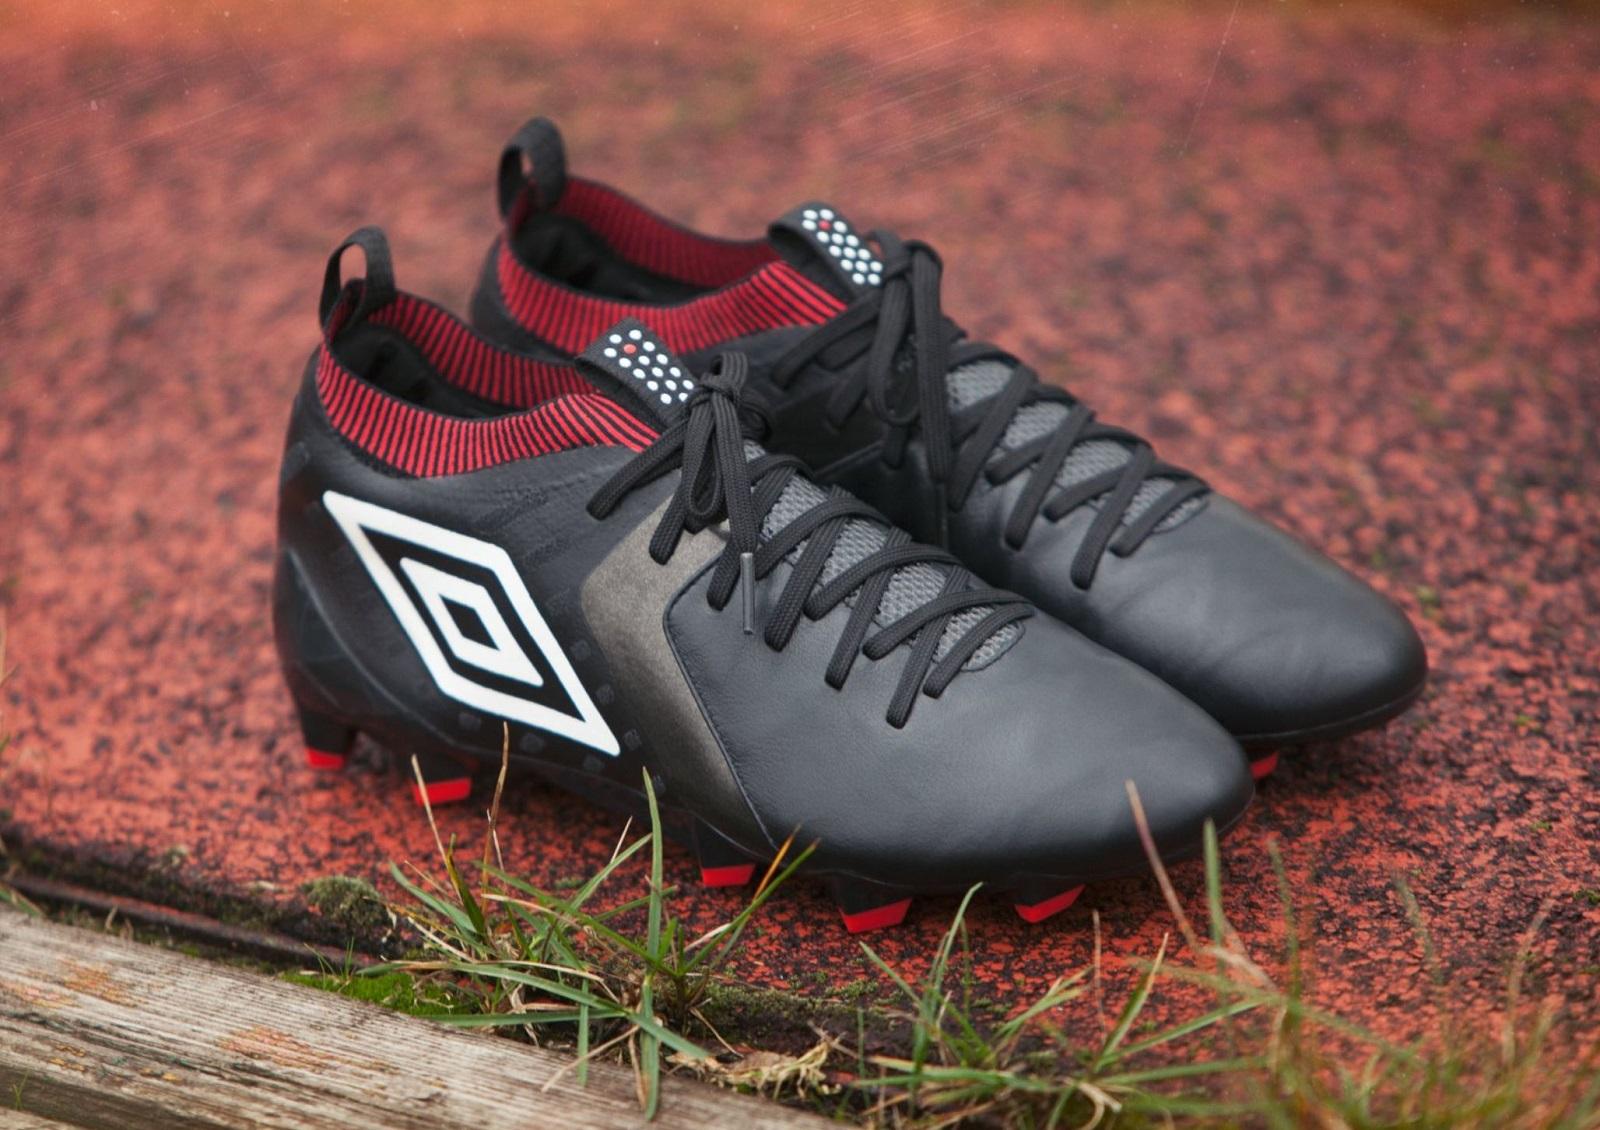 Umbro Medusae II World Cup boots   Soccer Cleats 101